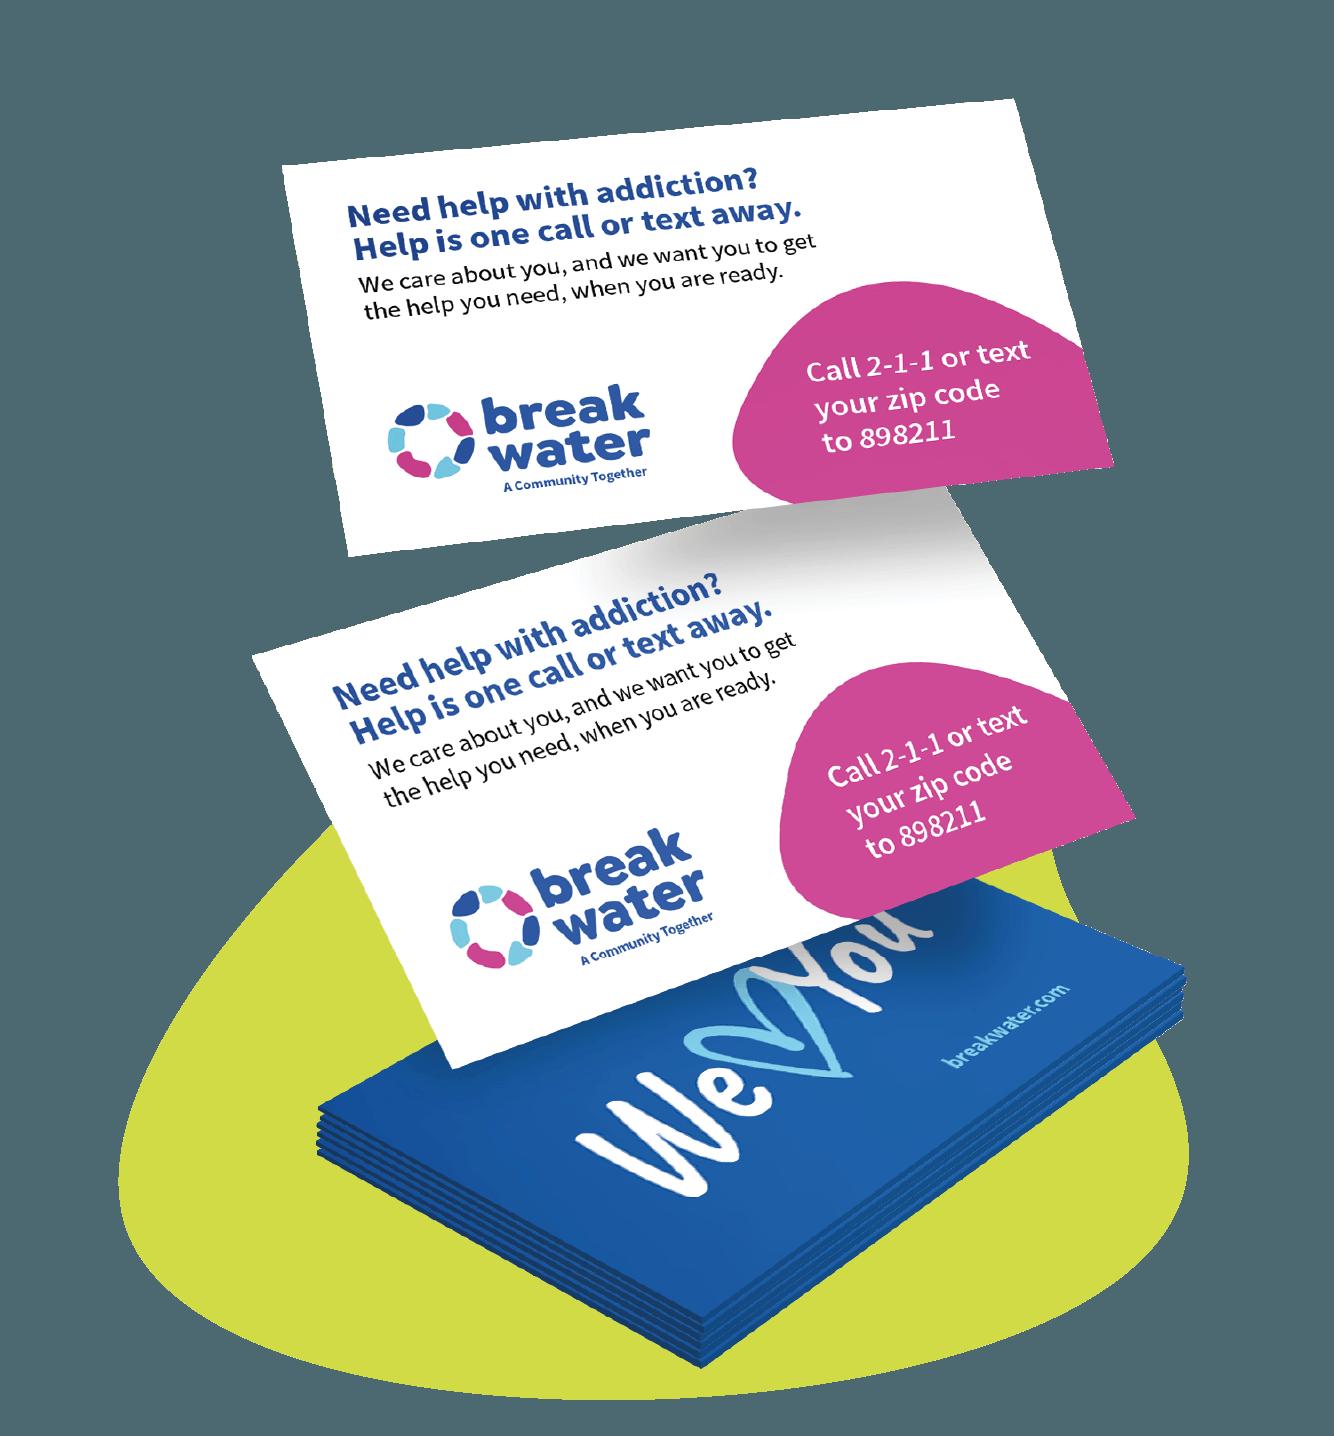 Breakwater community hotline business cards.